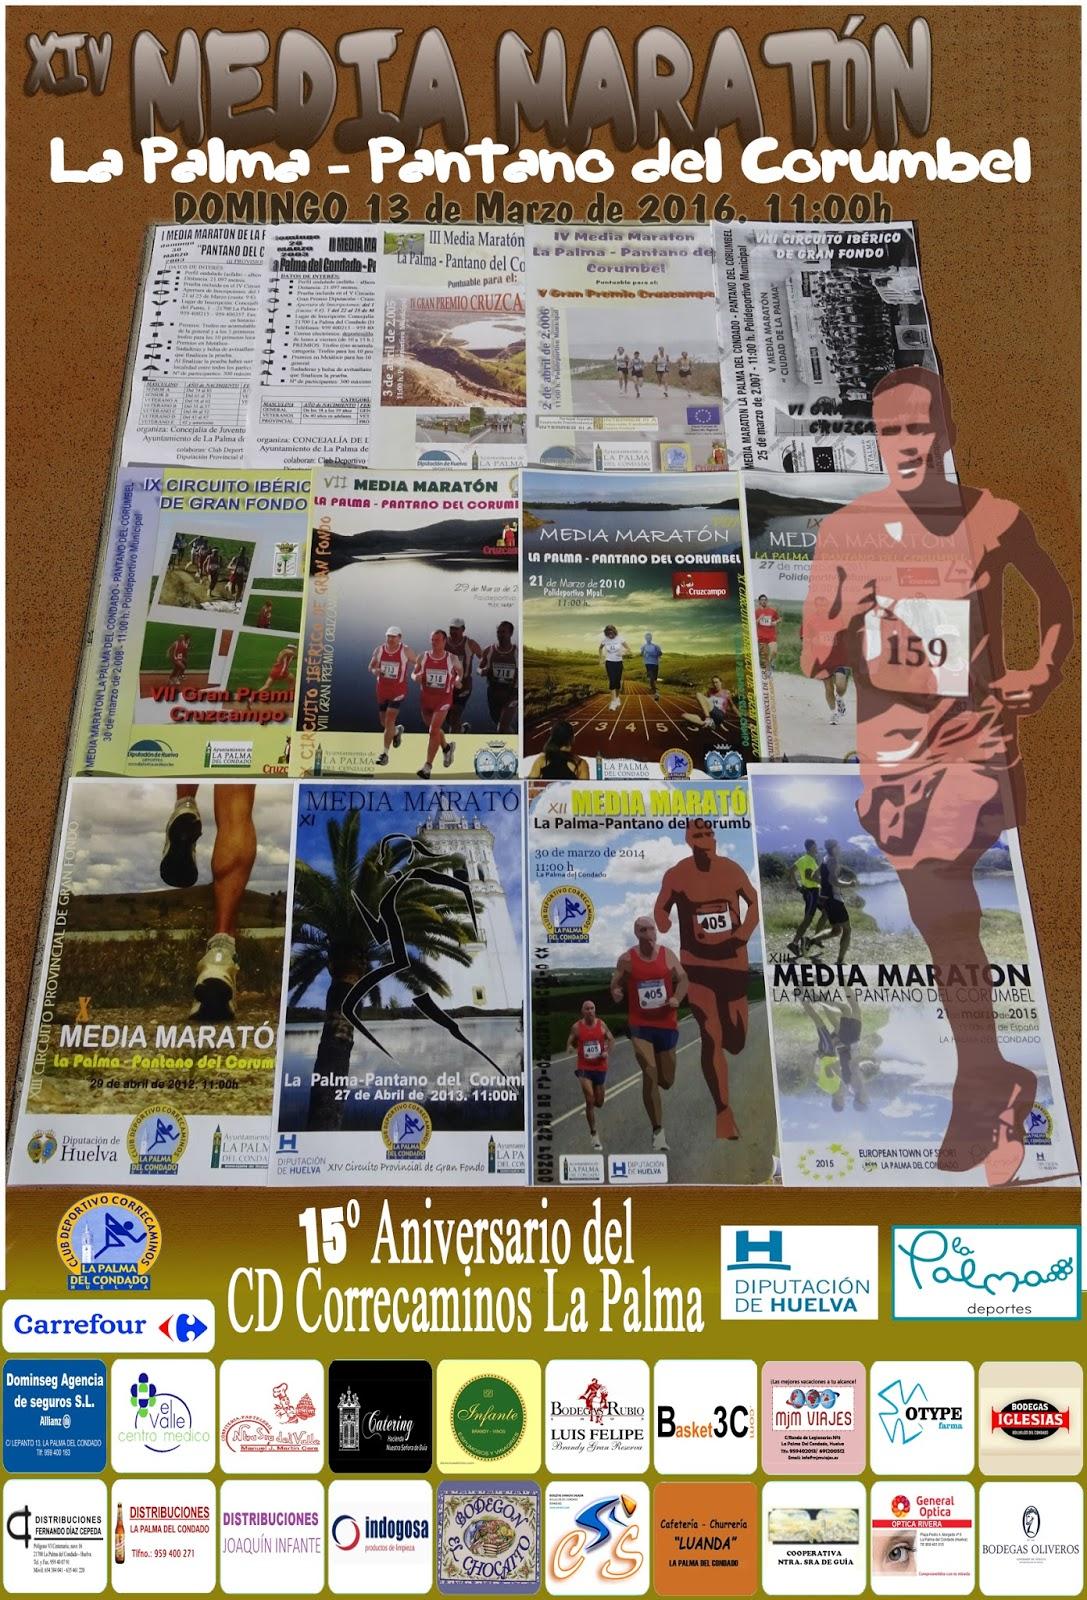 XIV Media Maratón La Palma - Pantano del Corumbel